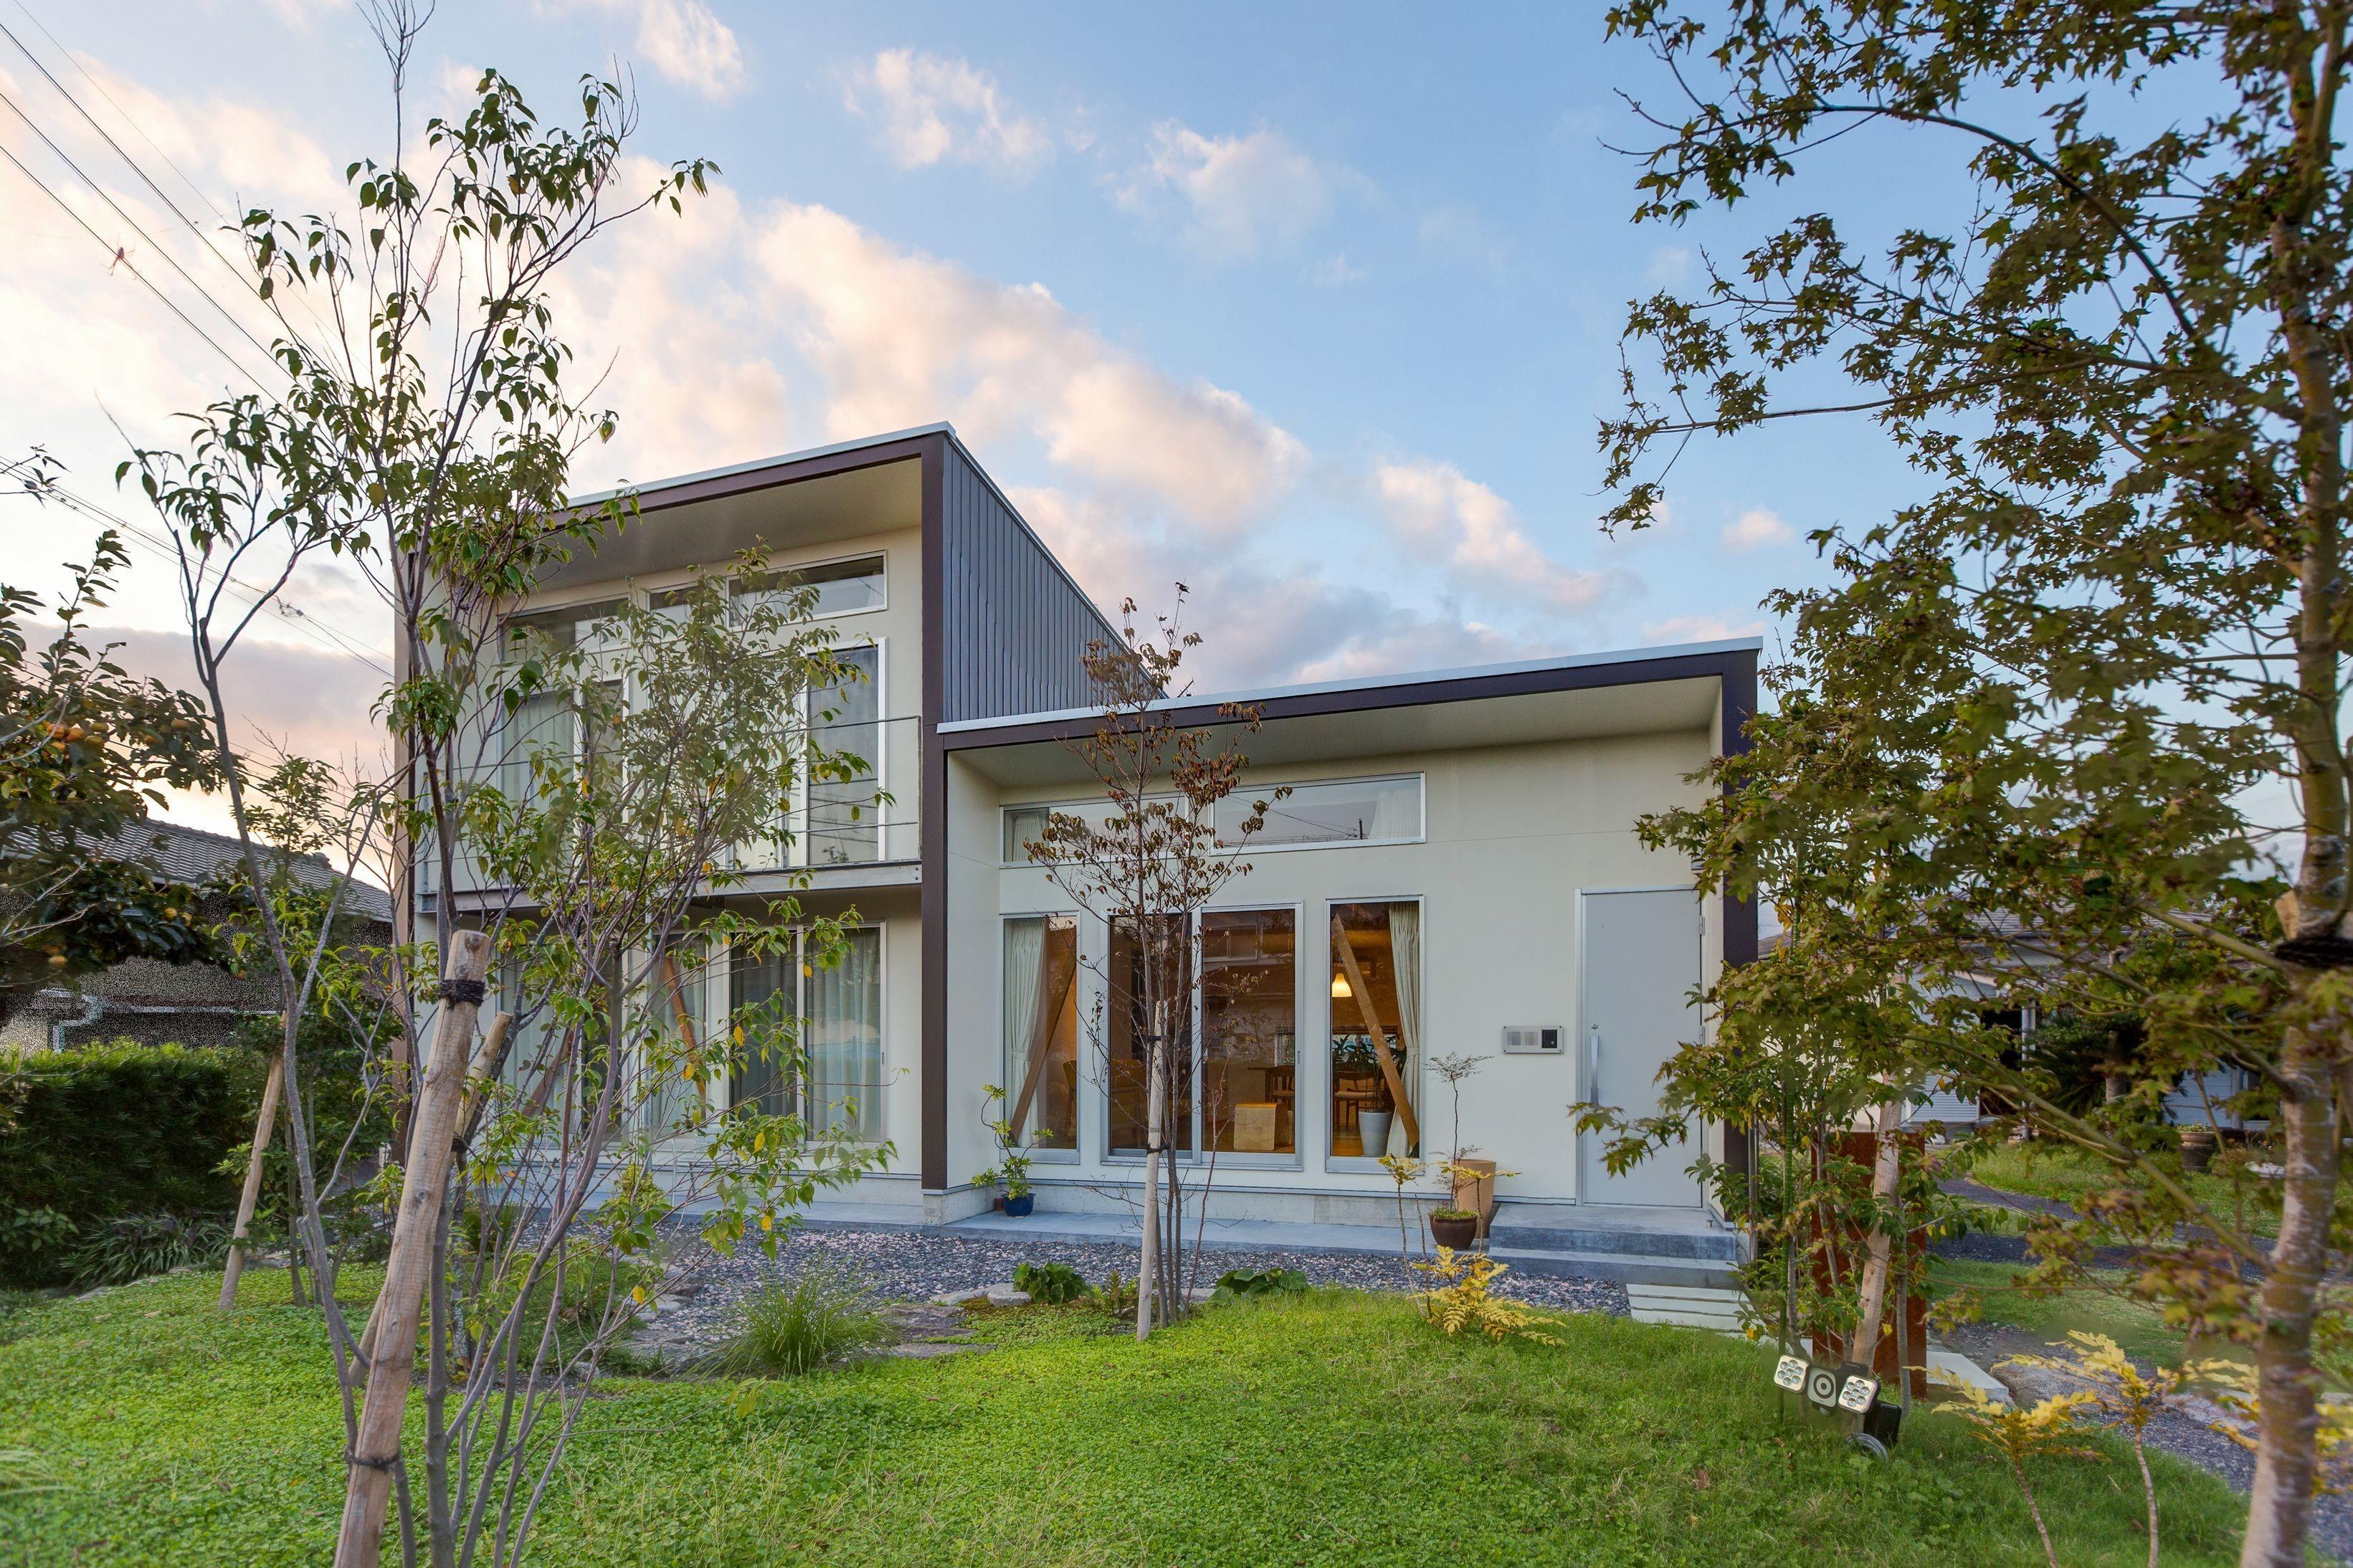 外観事例:南側外観(3-BOX 1800万円の家)